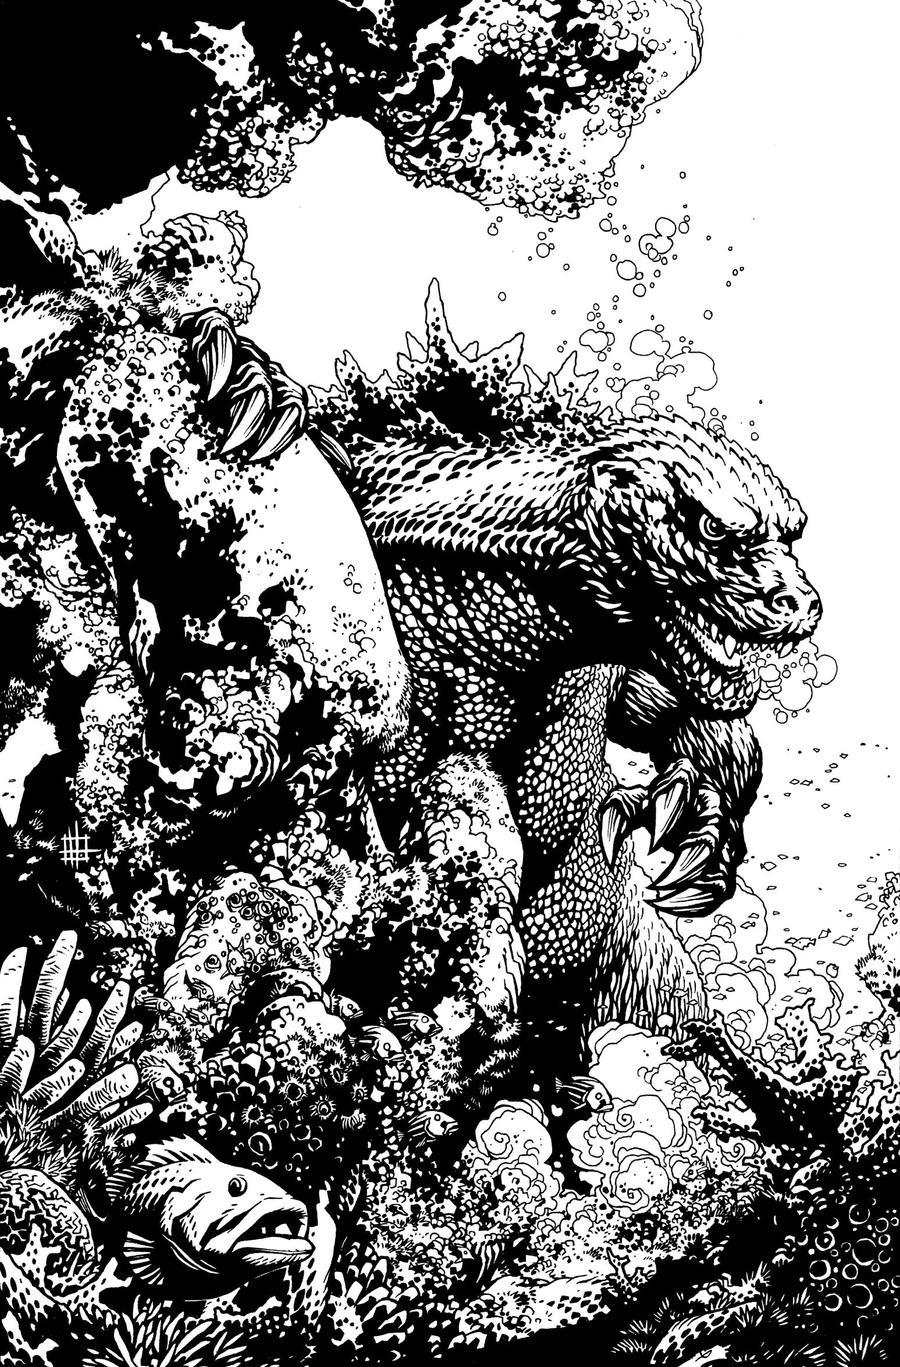 Godzilla Cover 1 by Spacefriend-KRUNK